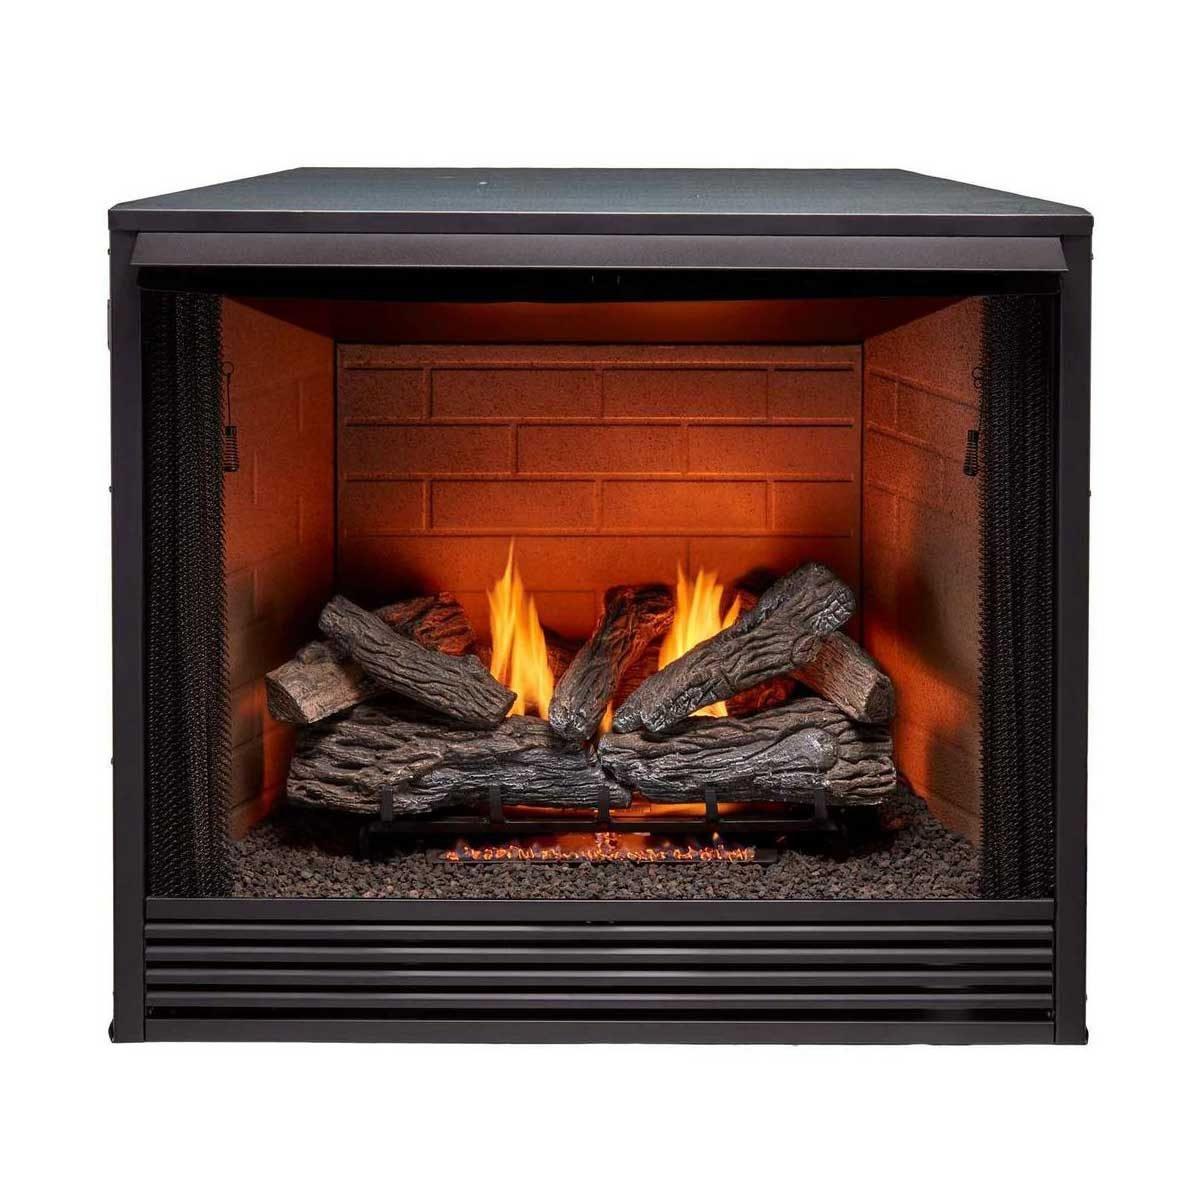 Gas Fireplace Insert Procom Gas Fireplace Inserts 170016 64 1000